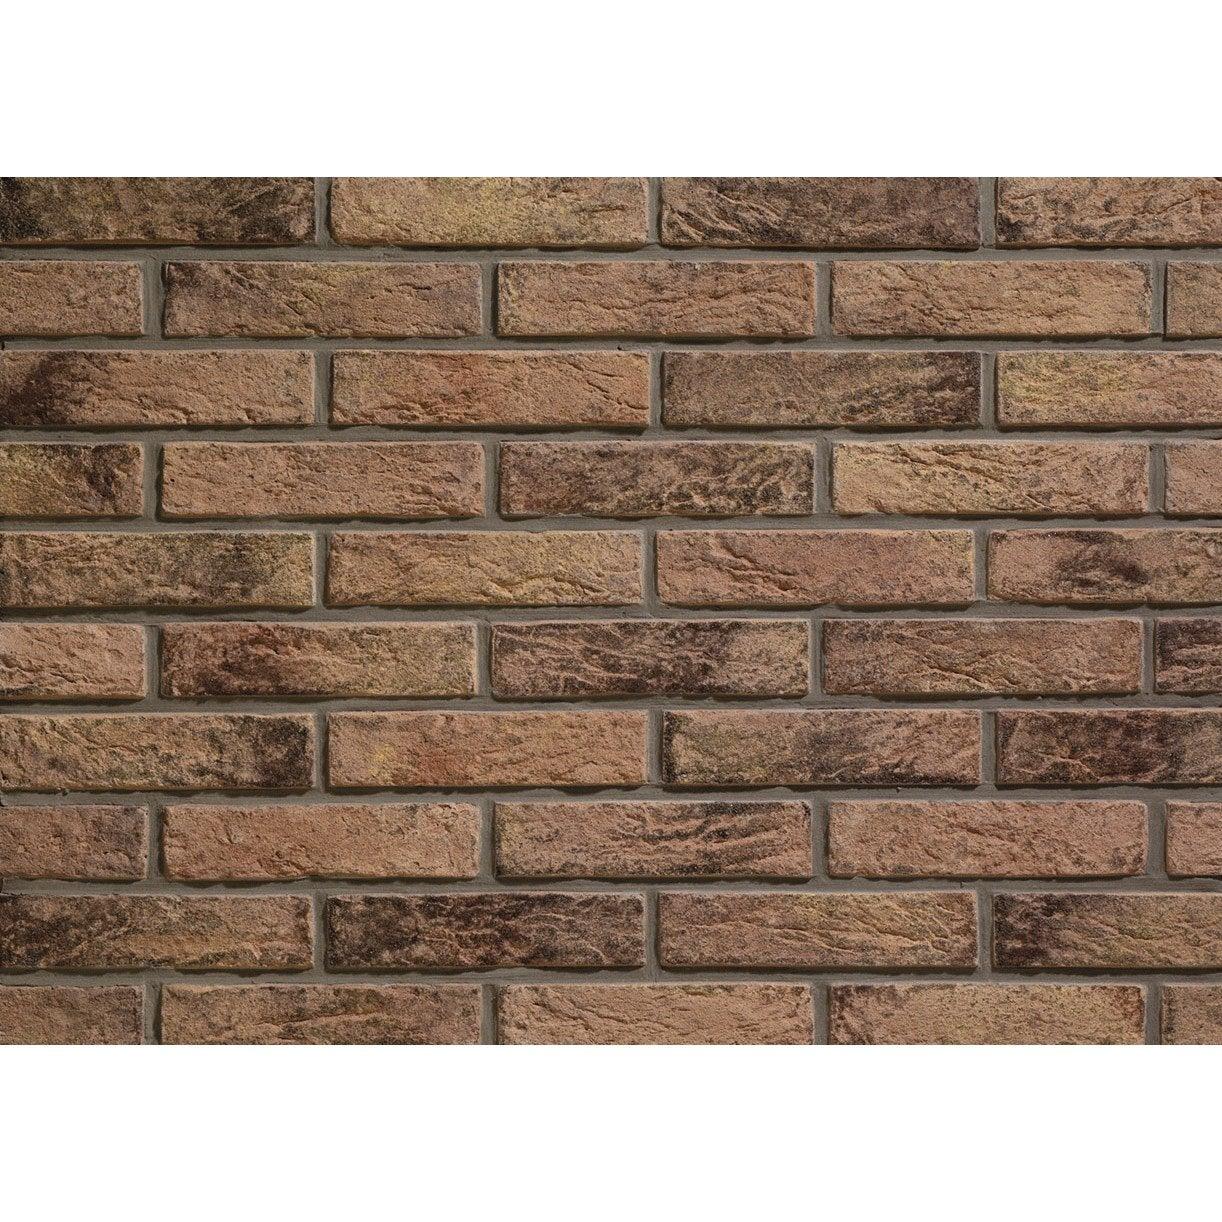 Plaquette de parement bruy re en b ton brun leroy merlin - Plaque beton leroy merlin ...